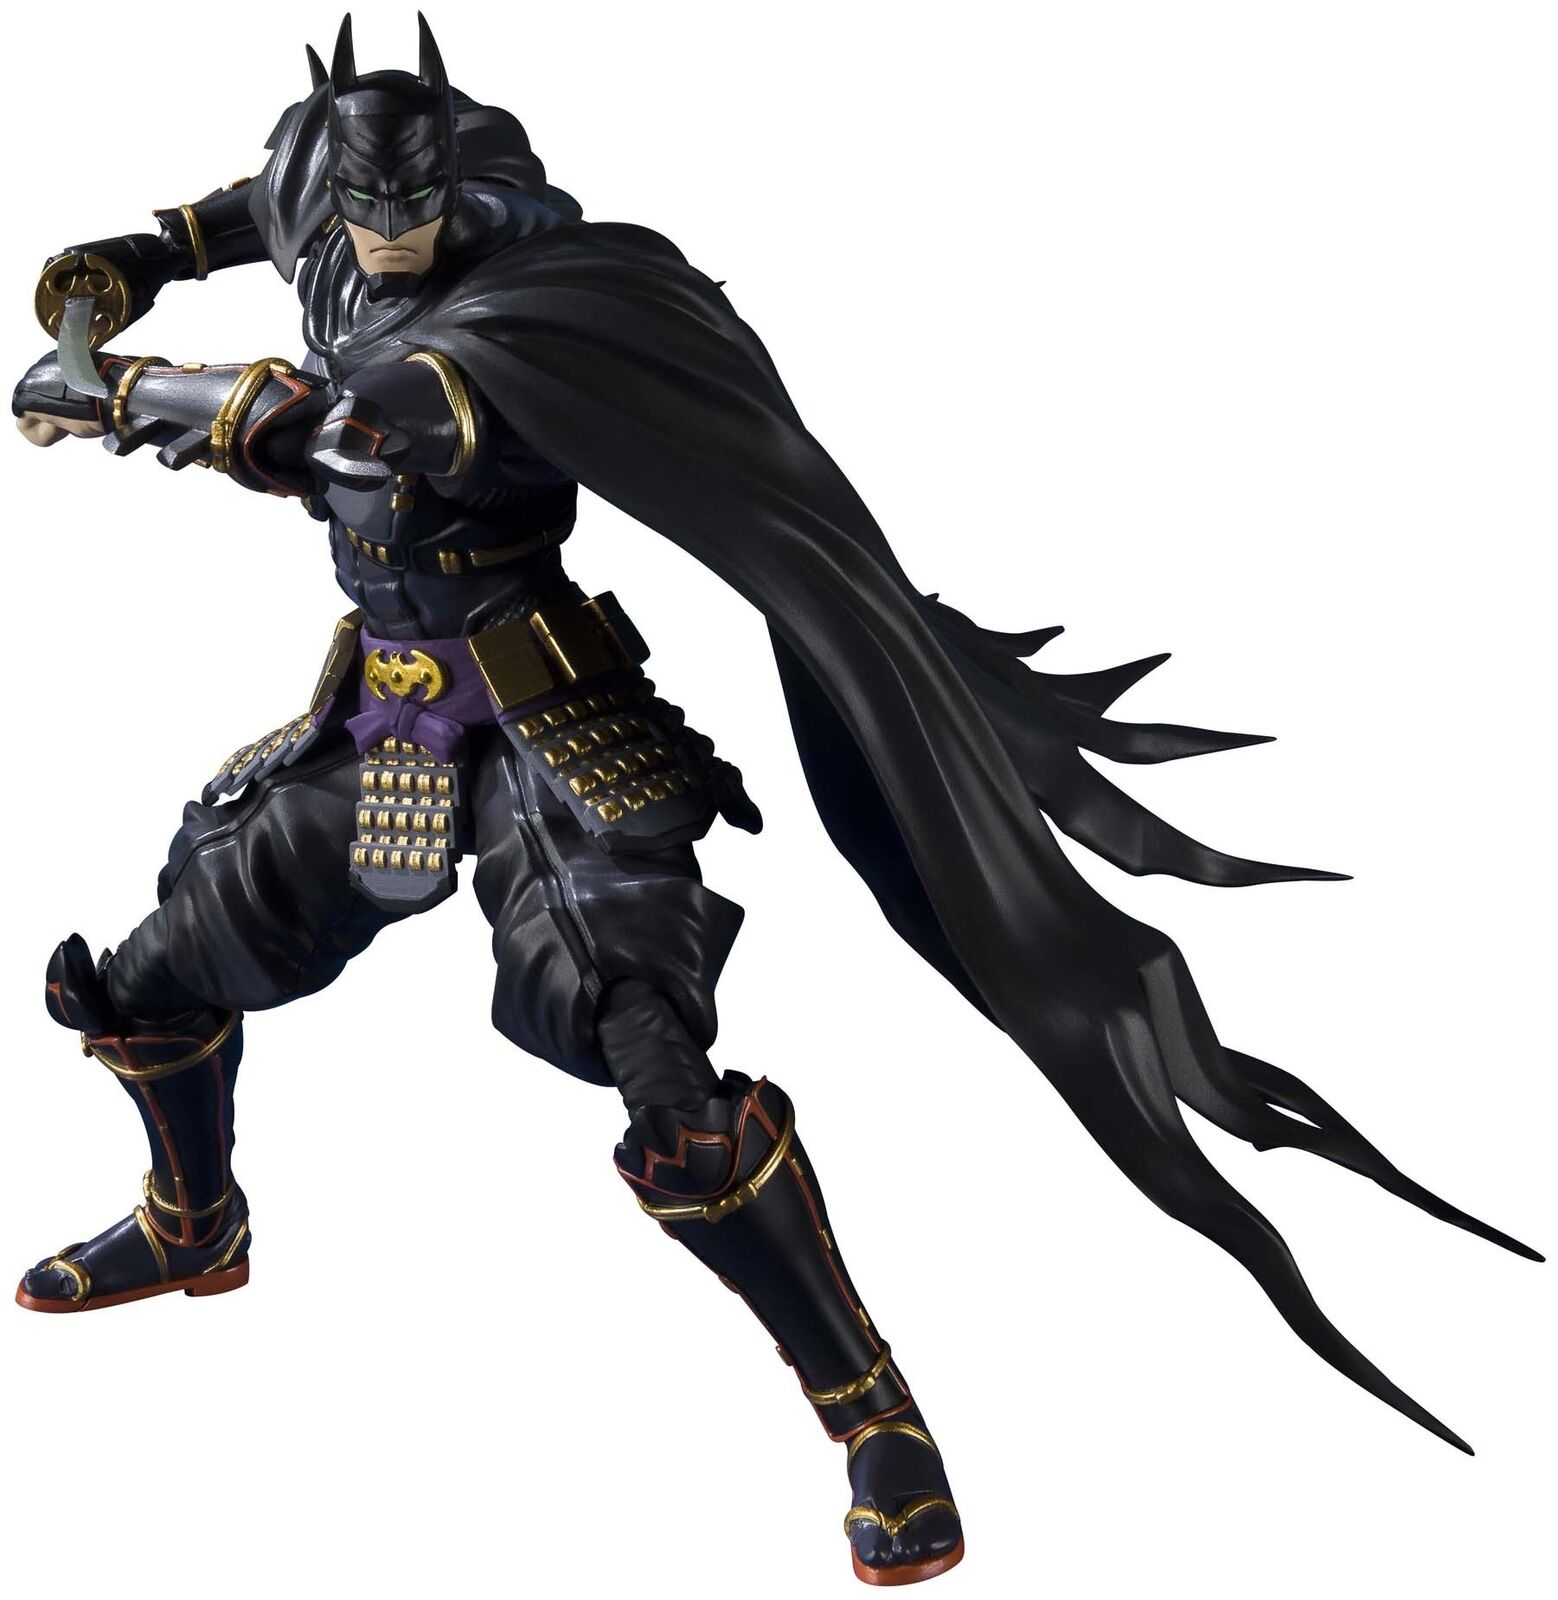 DC S.H. Figuarts Ninja Batman Action Figure